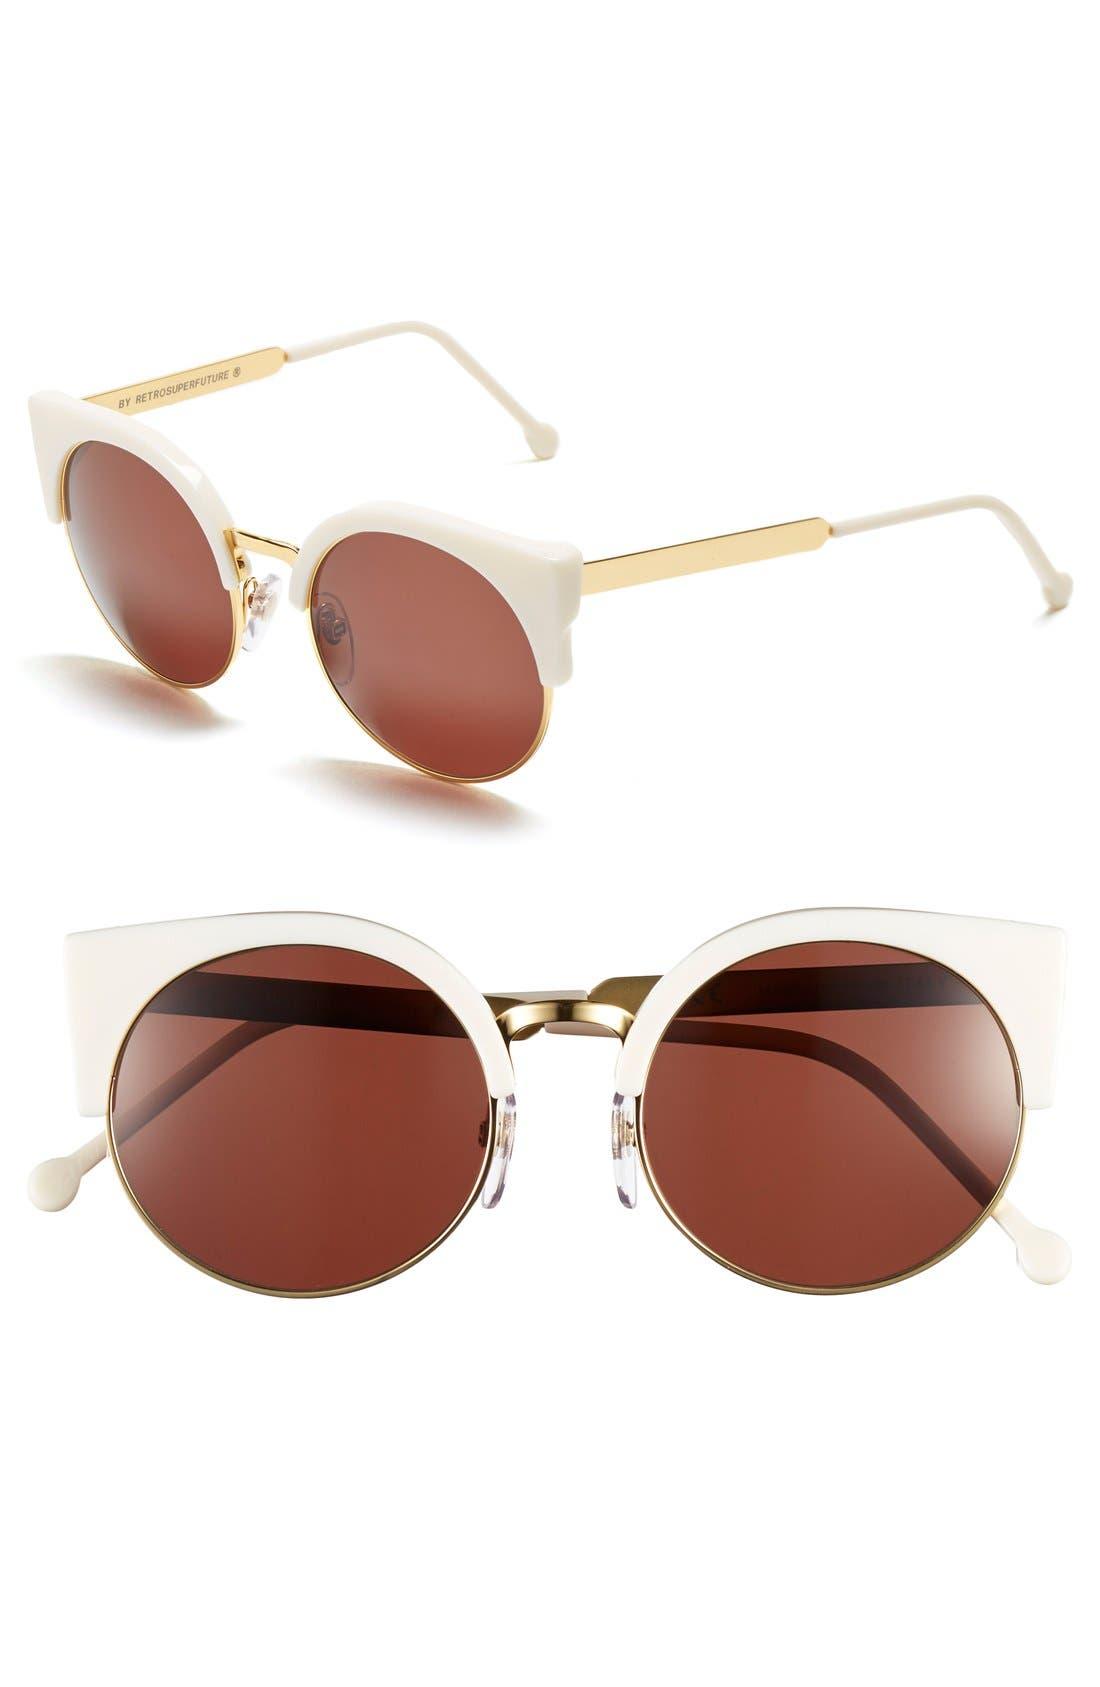 Alternate Image 1 Selected - SUPER by RETROSUPERFUTURE® 'Lucia' 53mm Sunglasses